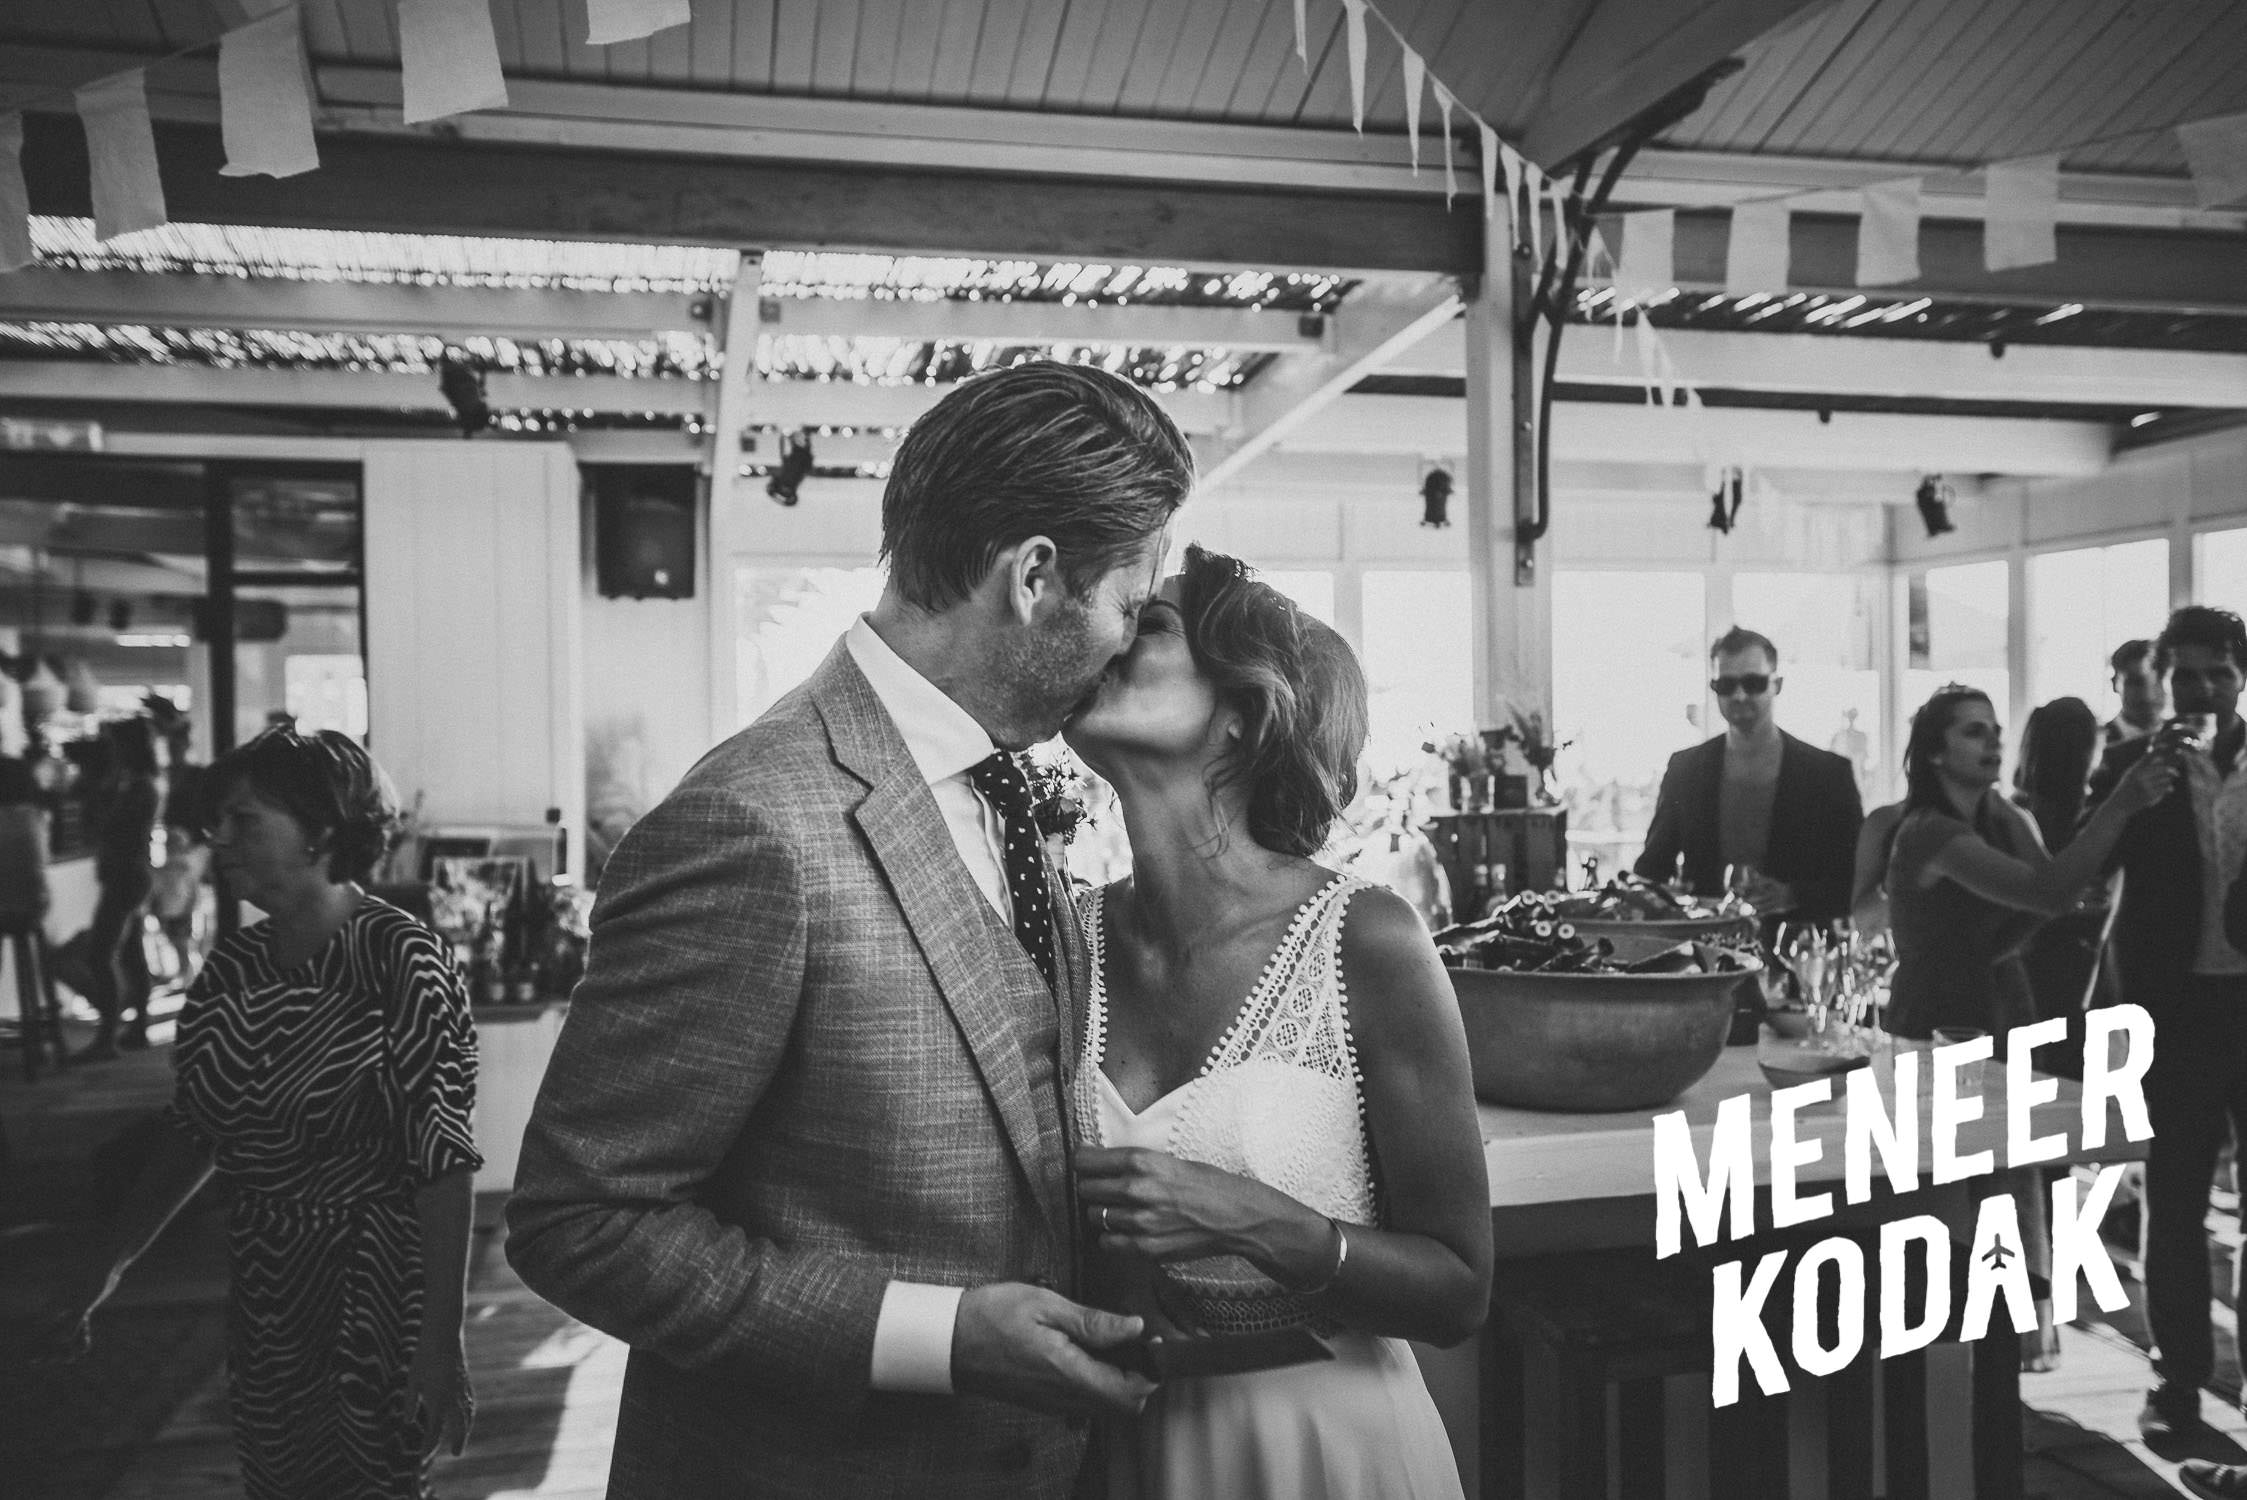 Meneer Kodak - Strandbruiloft - Noordwijk - K&A-110.jpg